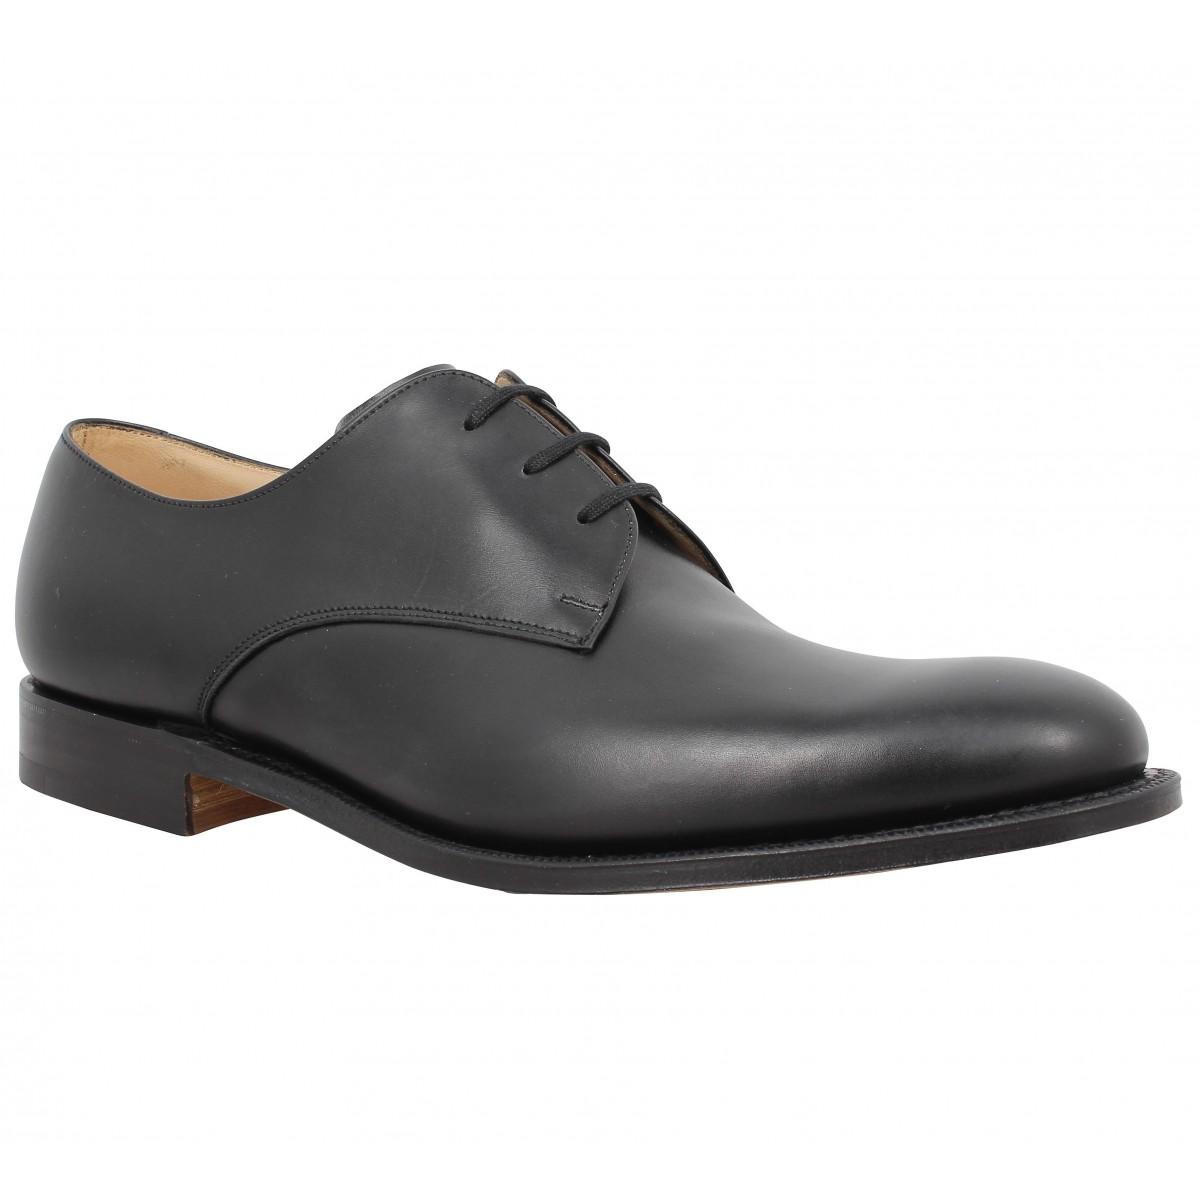 Chaussures à lacets CHURCH'S Oslo cuir Noir